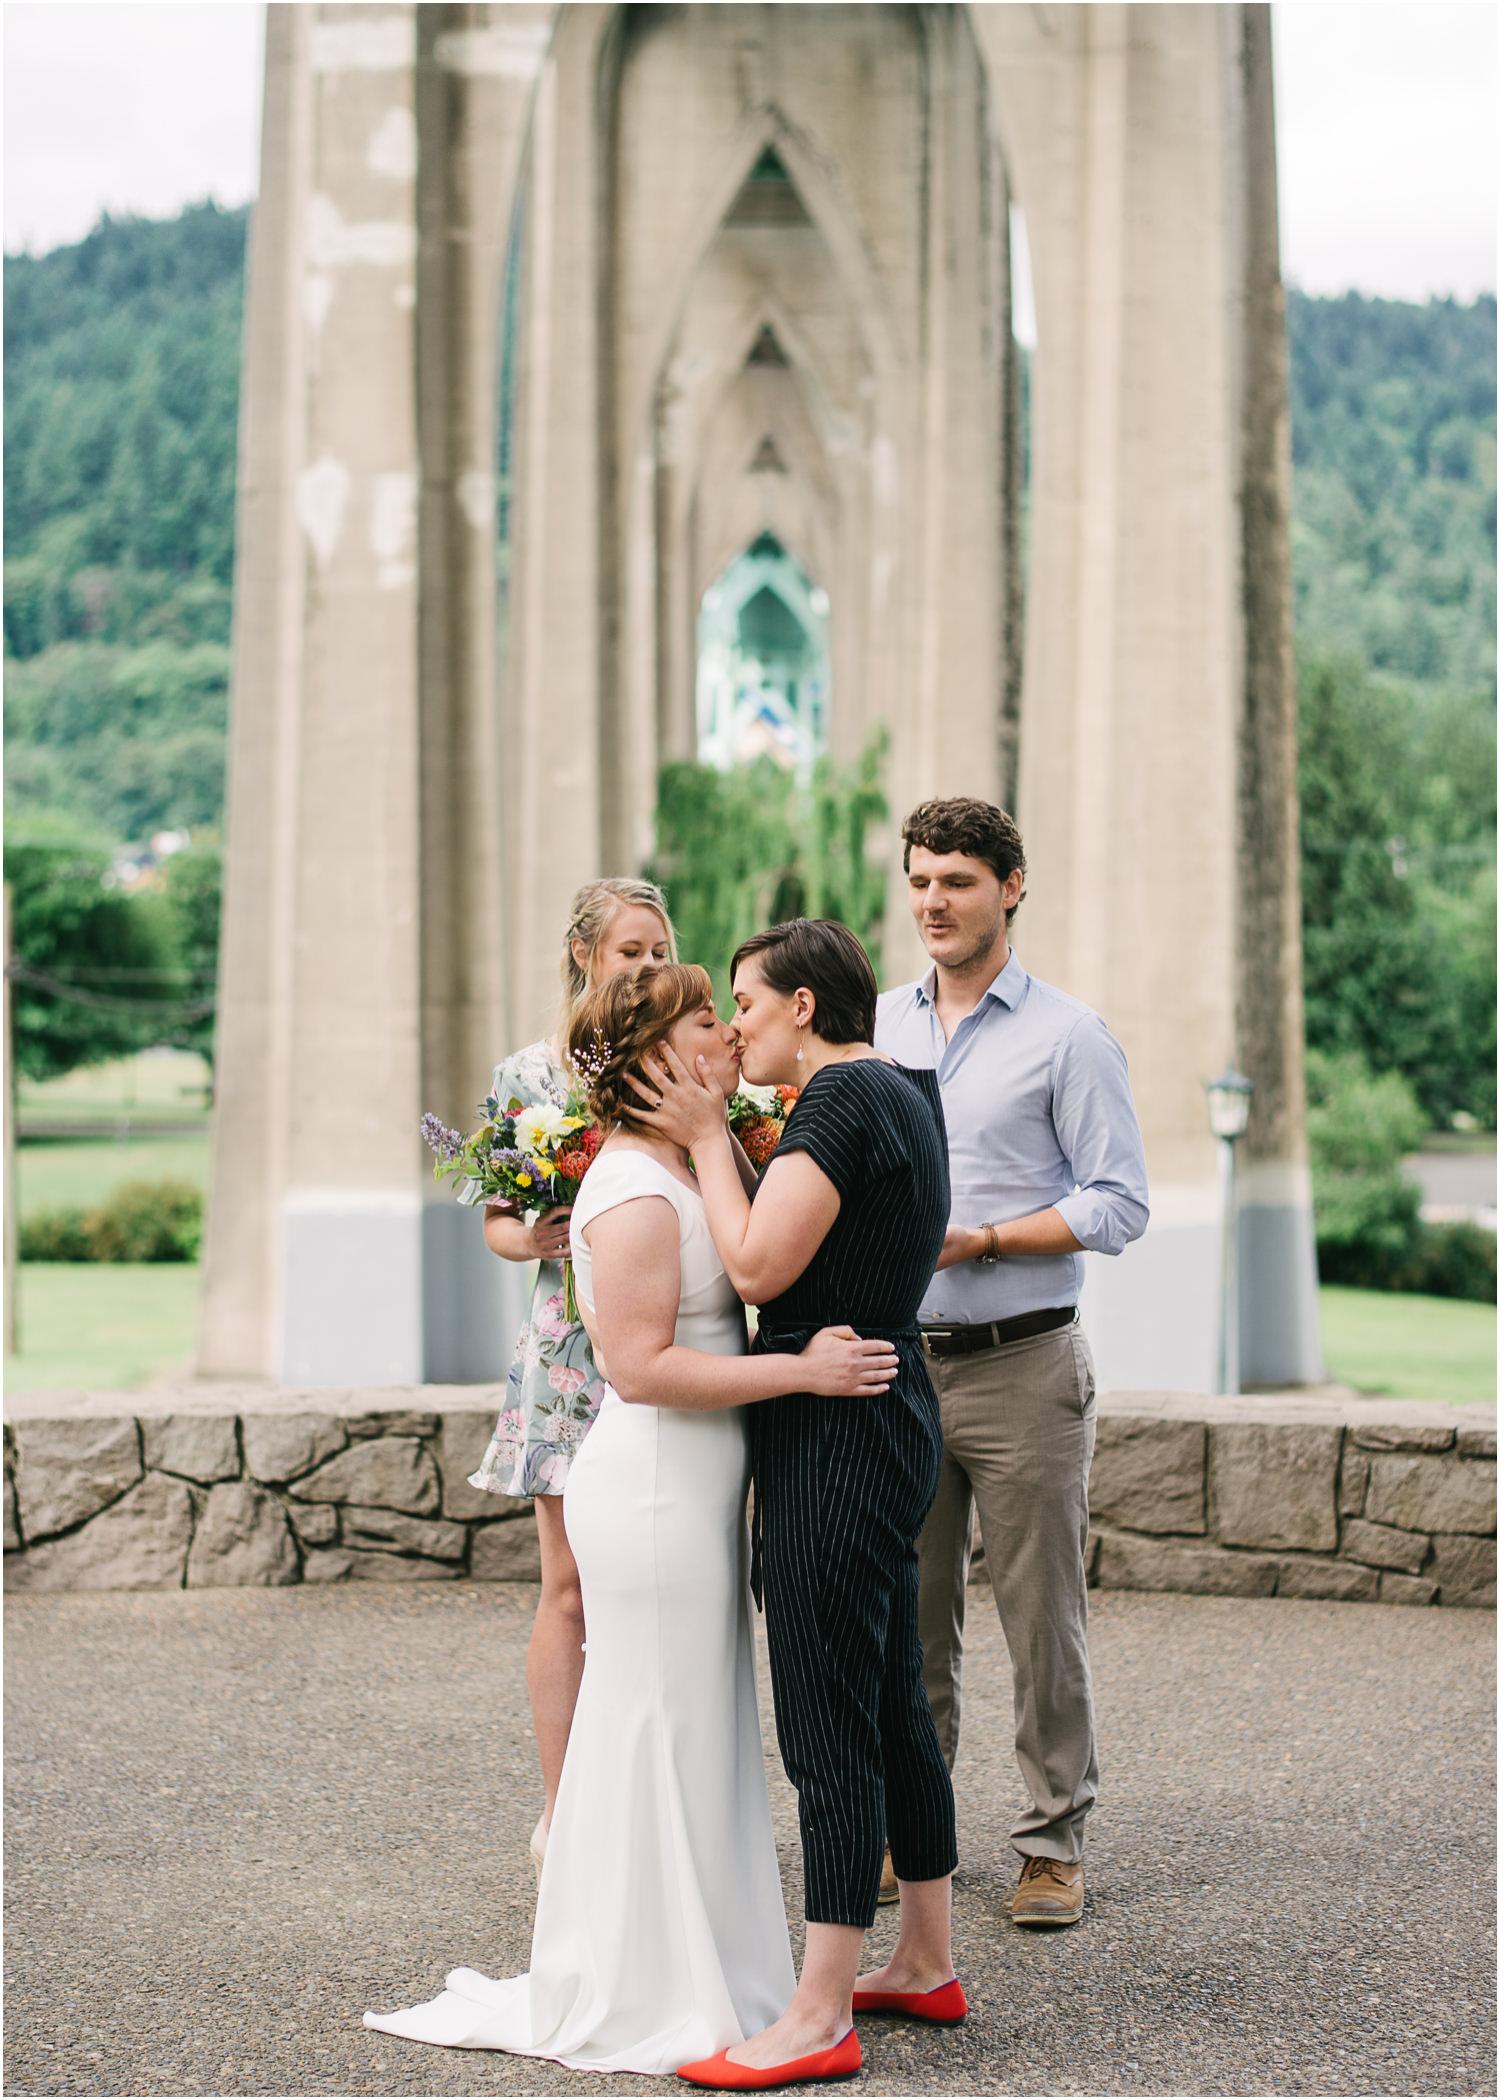 cathedral-park-portland-elopement-gay-wedding-031.JPG